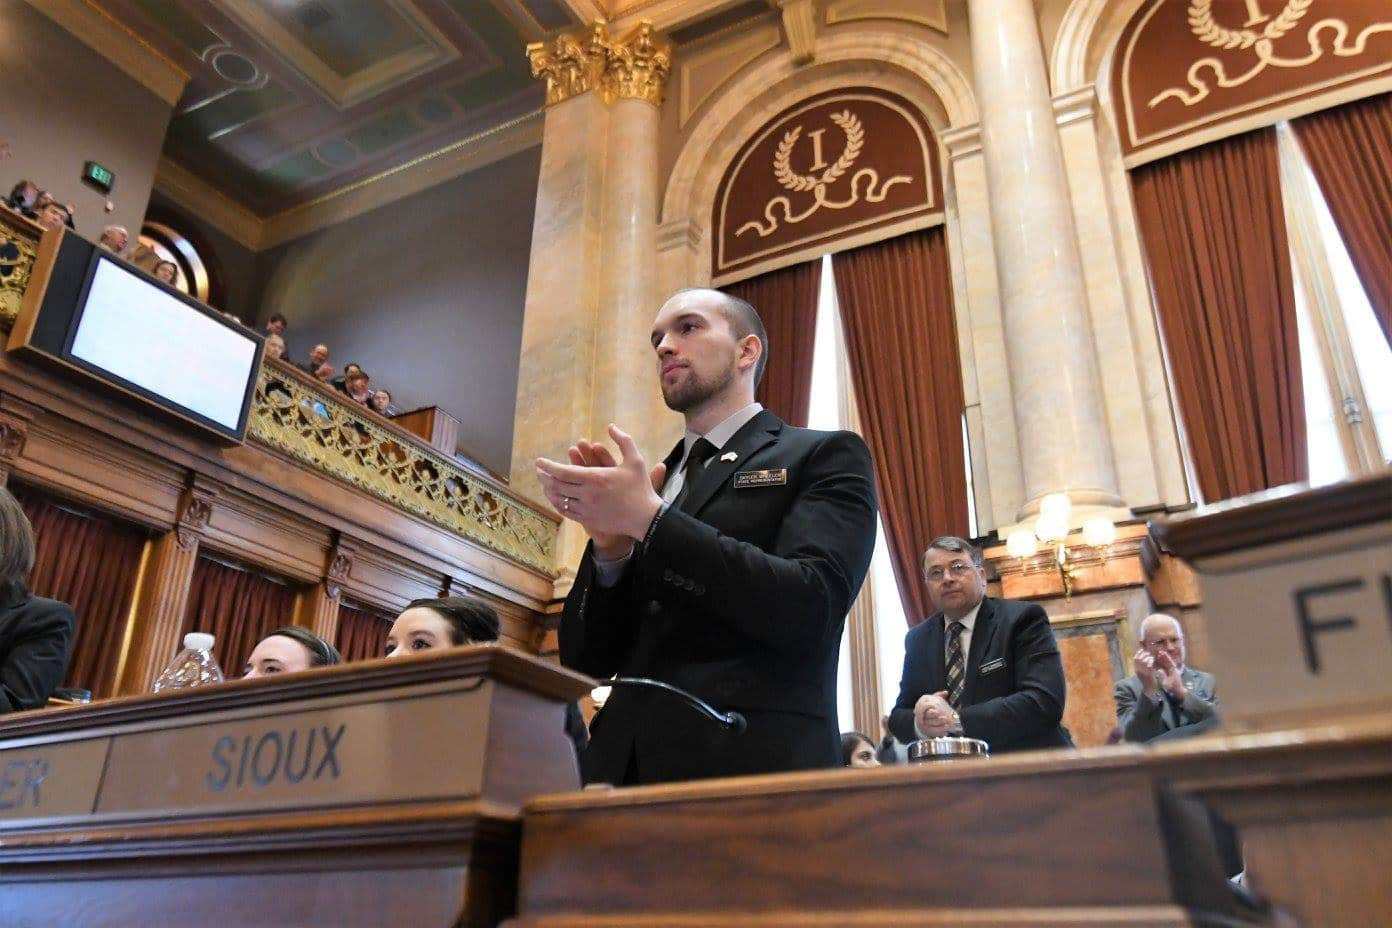 State Representative Skyler Wheeler (R-Orange City) on Opening Day 2017 in the Iowa House.